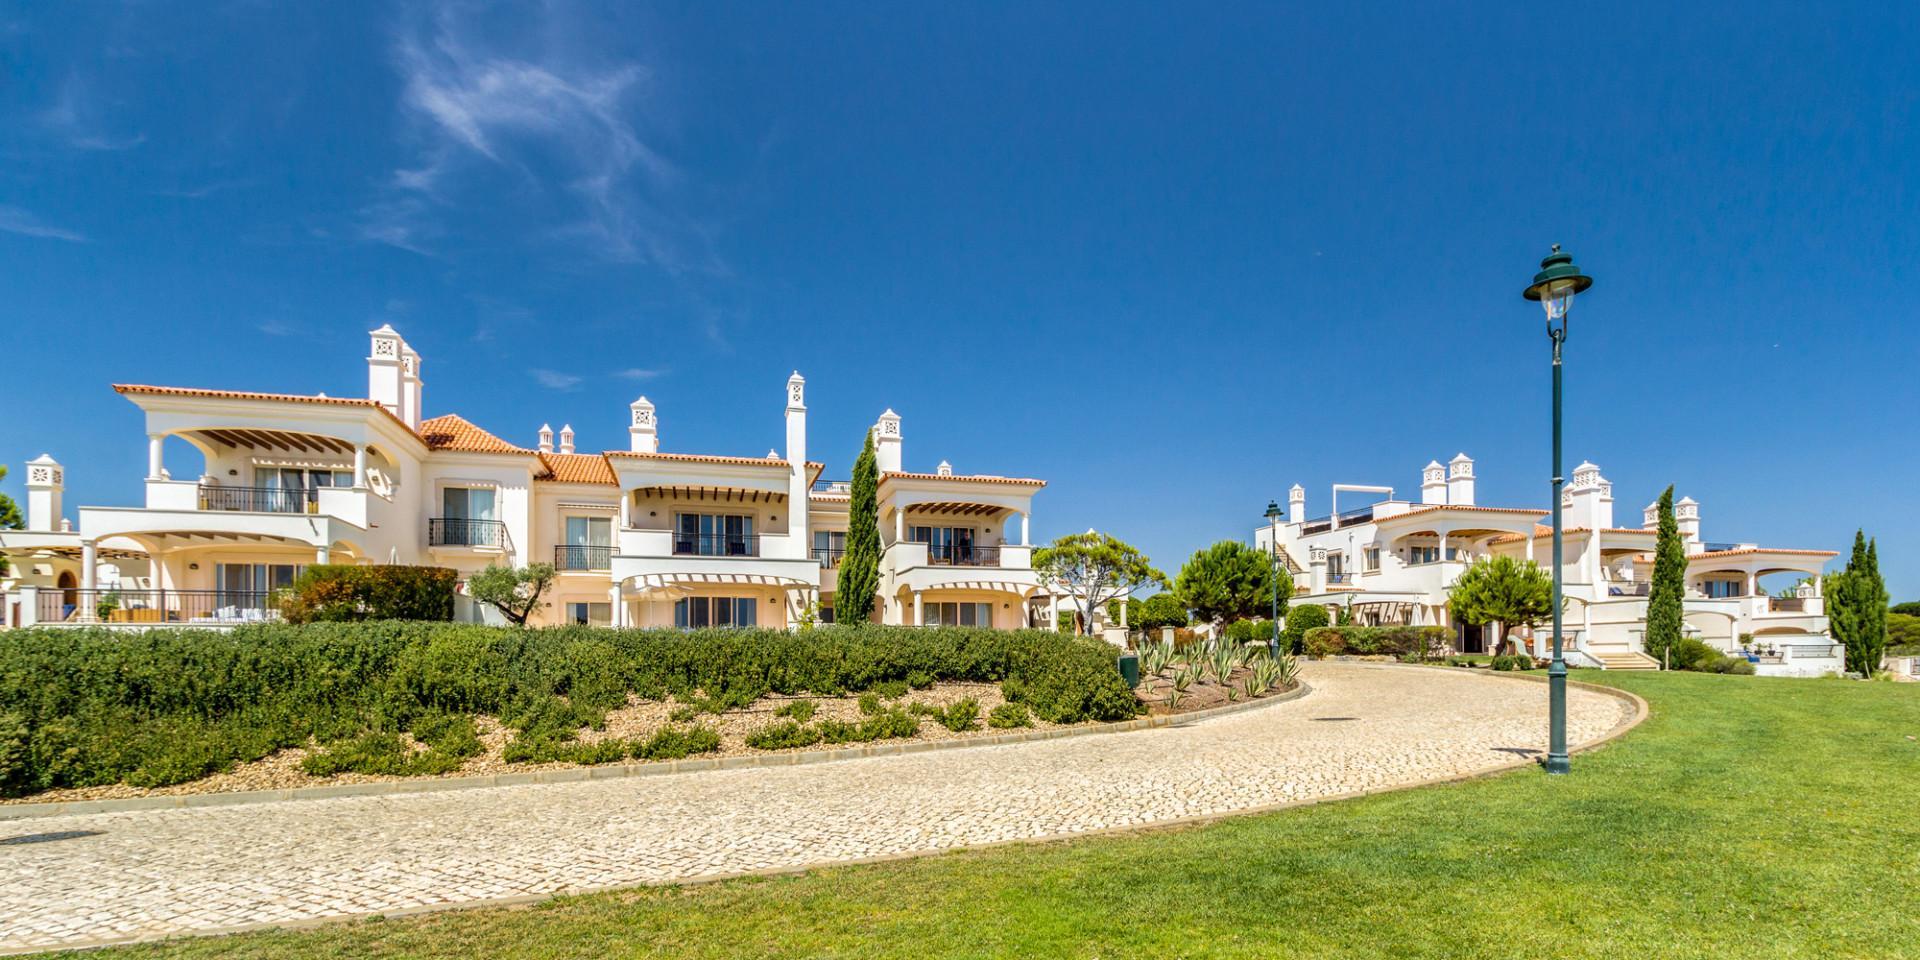 Dunas Douradas Beach Club Garden 1 bedroom Apartment - Dunas Douradas Beach Club, Vale do Lobo, Algarve - 2-1920x960.jpg